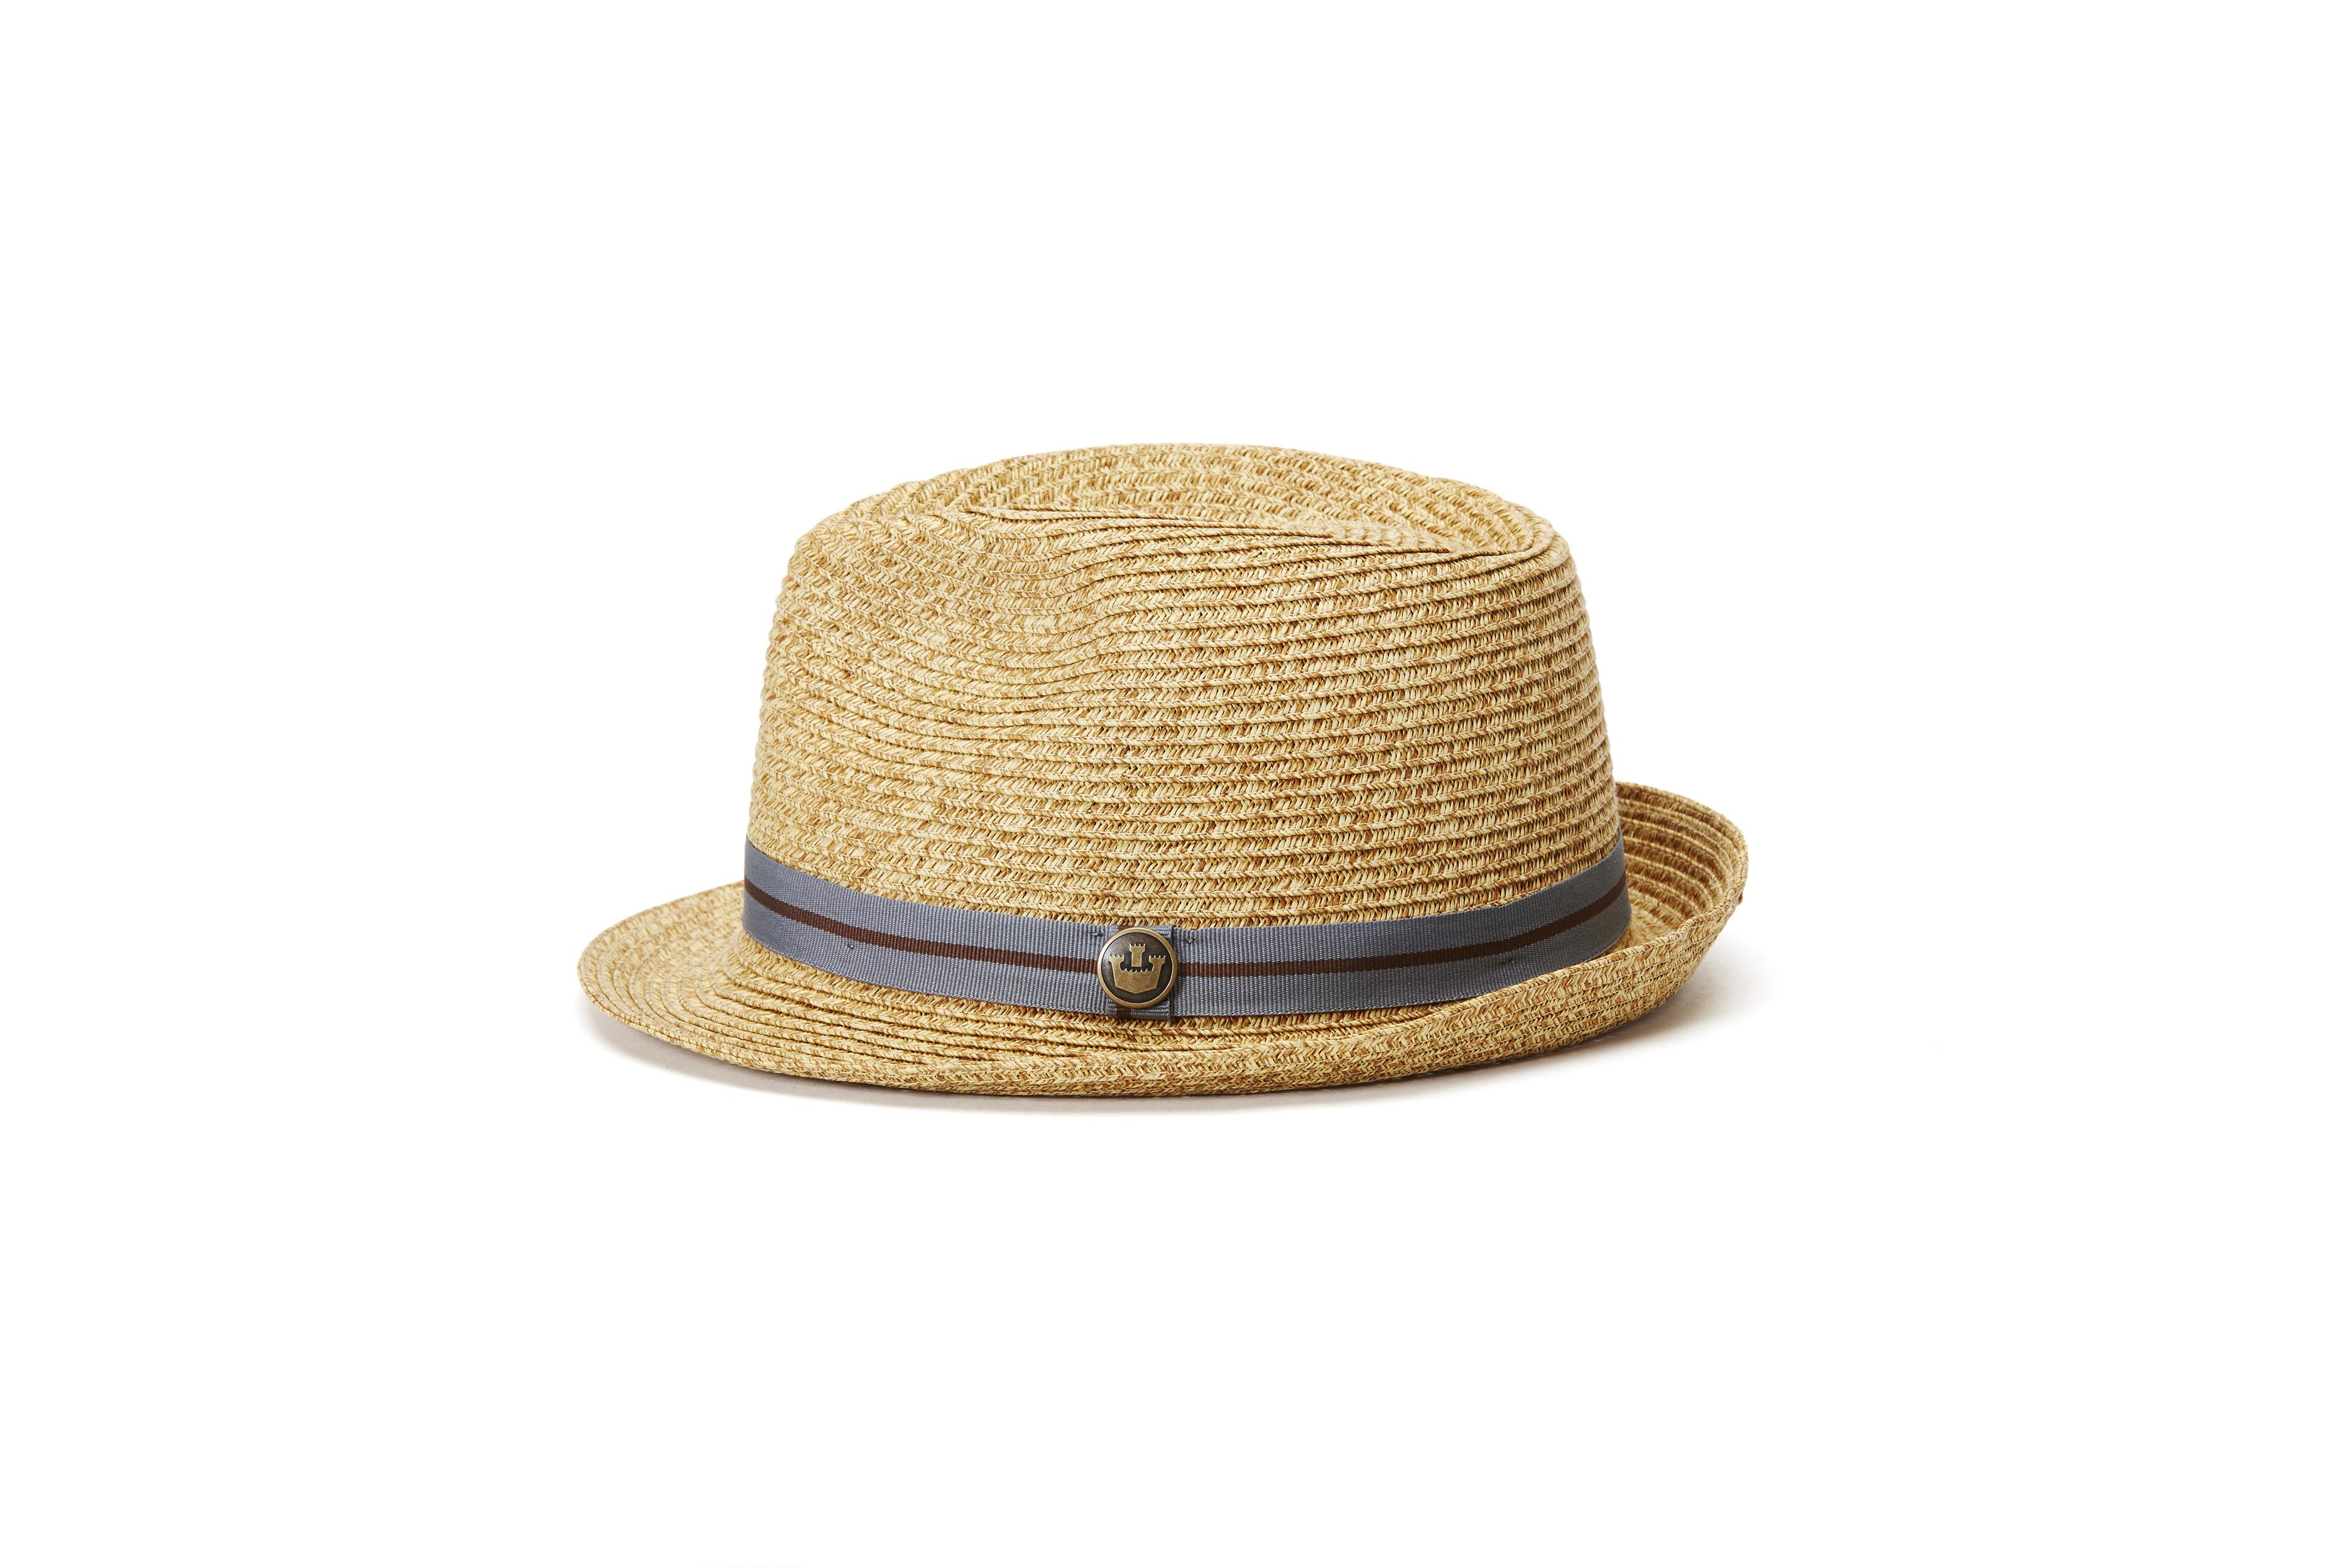 tan-straw-hat.jpg?mtime=20181207122927#asset:103983